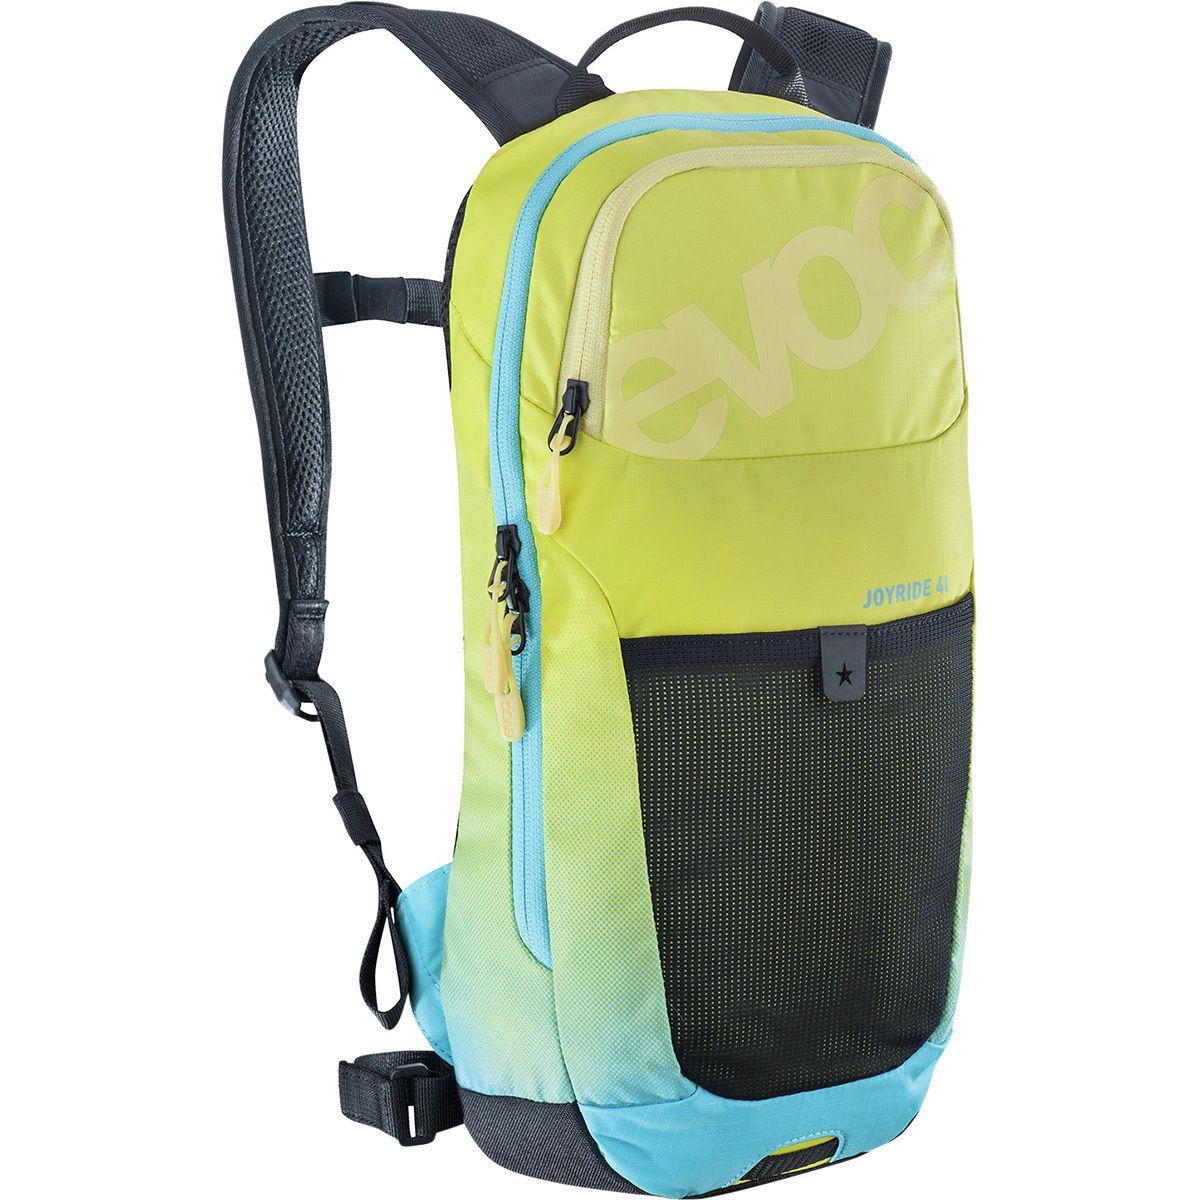 Evoc Joyride Hydration Backpack - Kids' Sulphur/Neon Blue, One Size